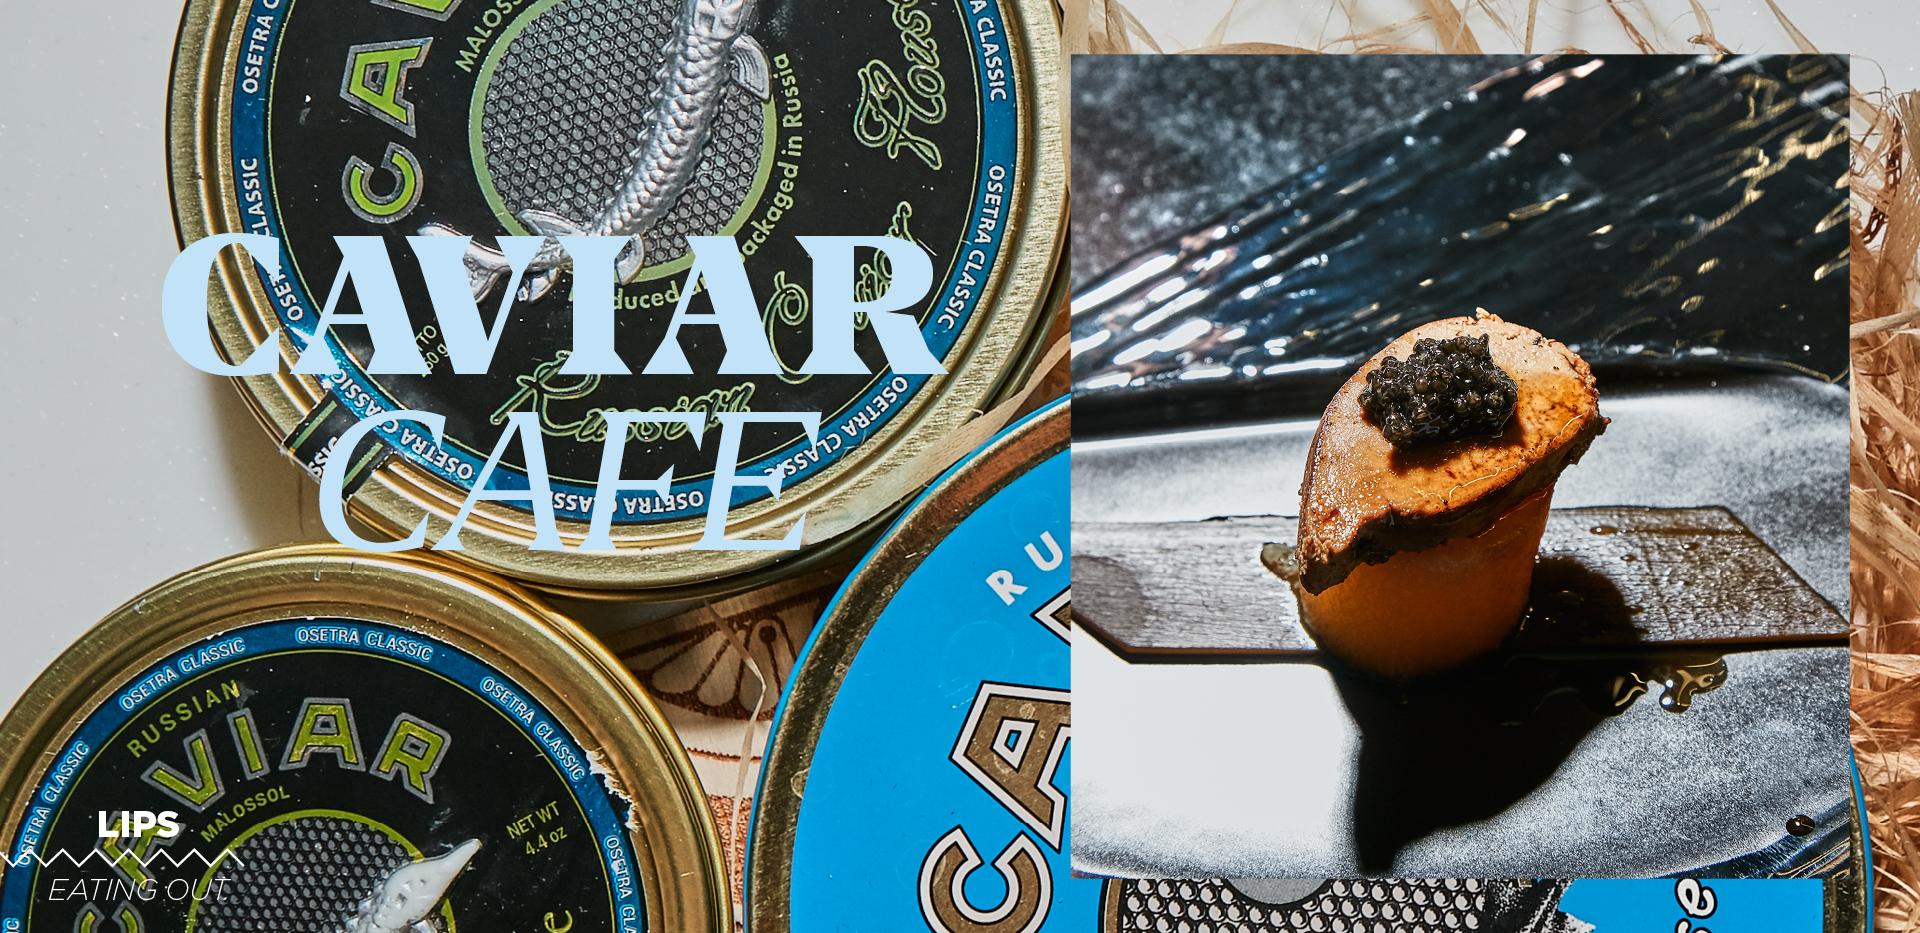 Caviar Cafe